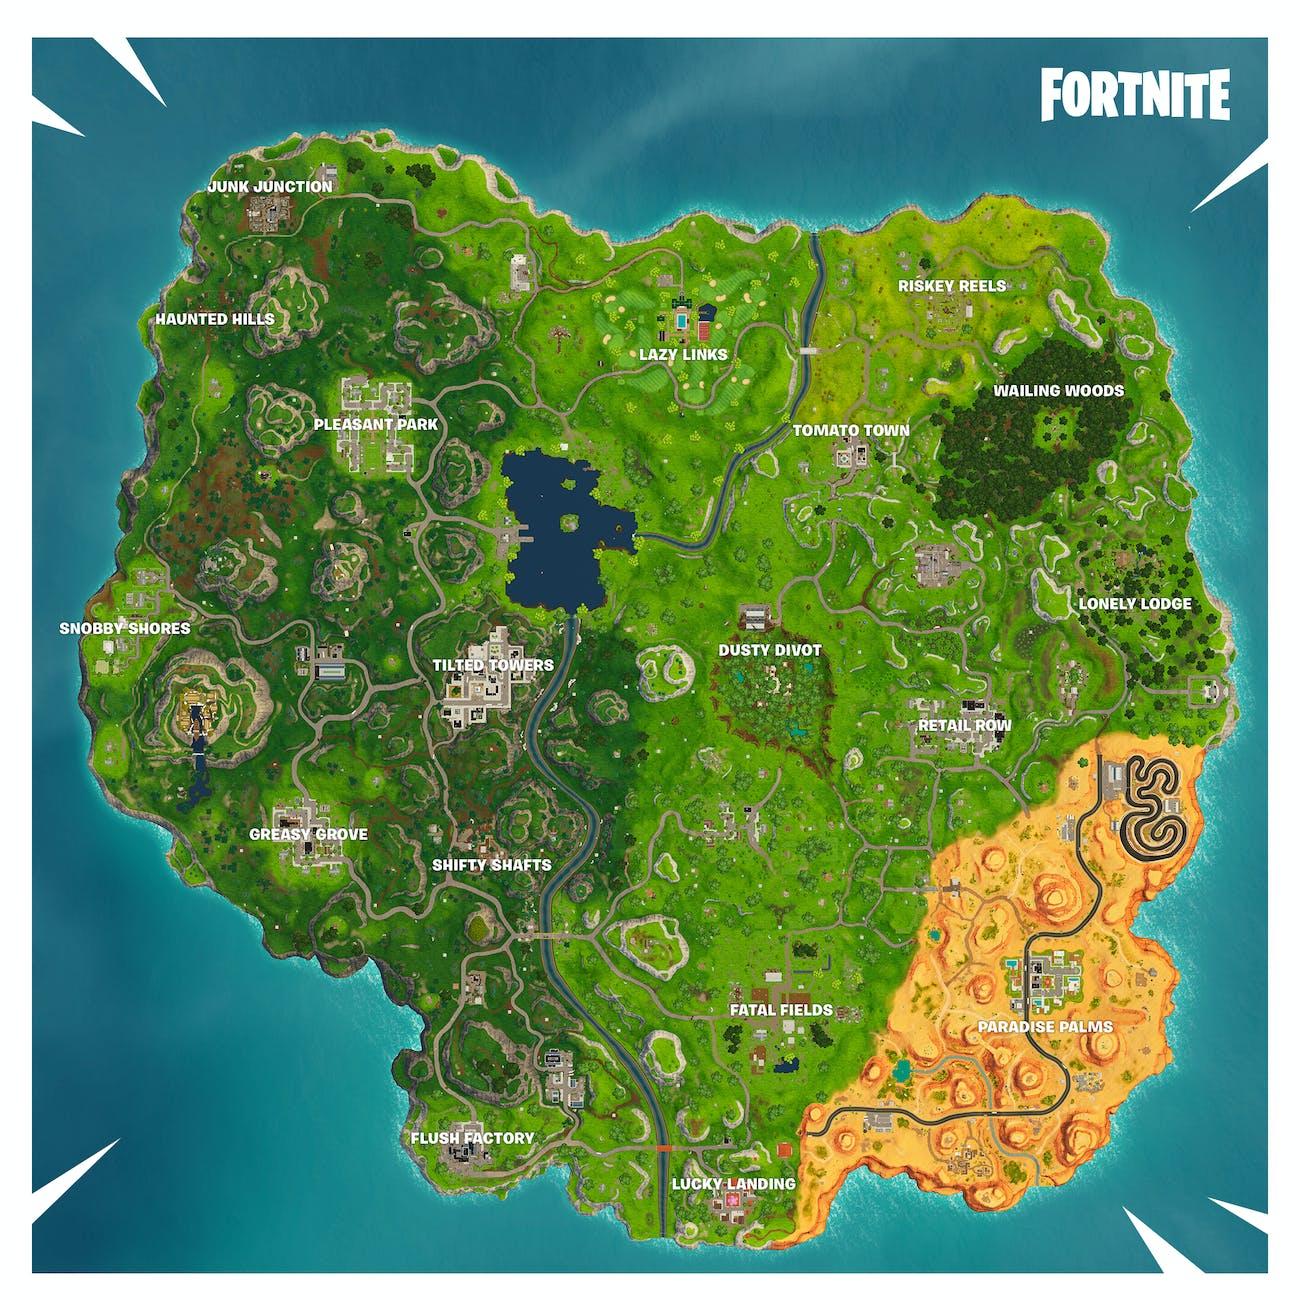 'Fortnite' Season 5 Map